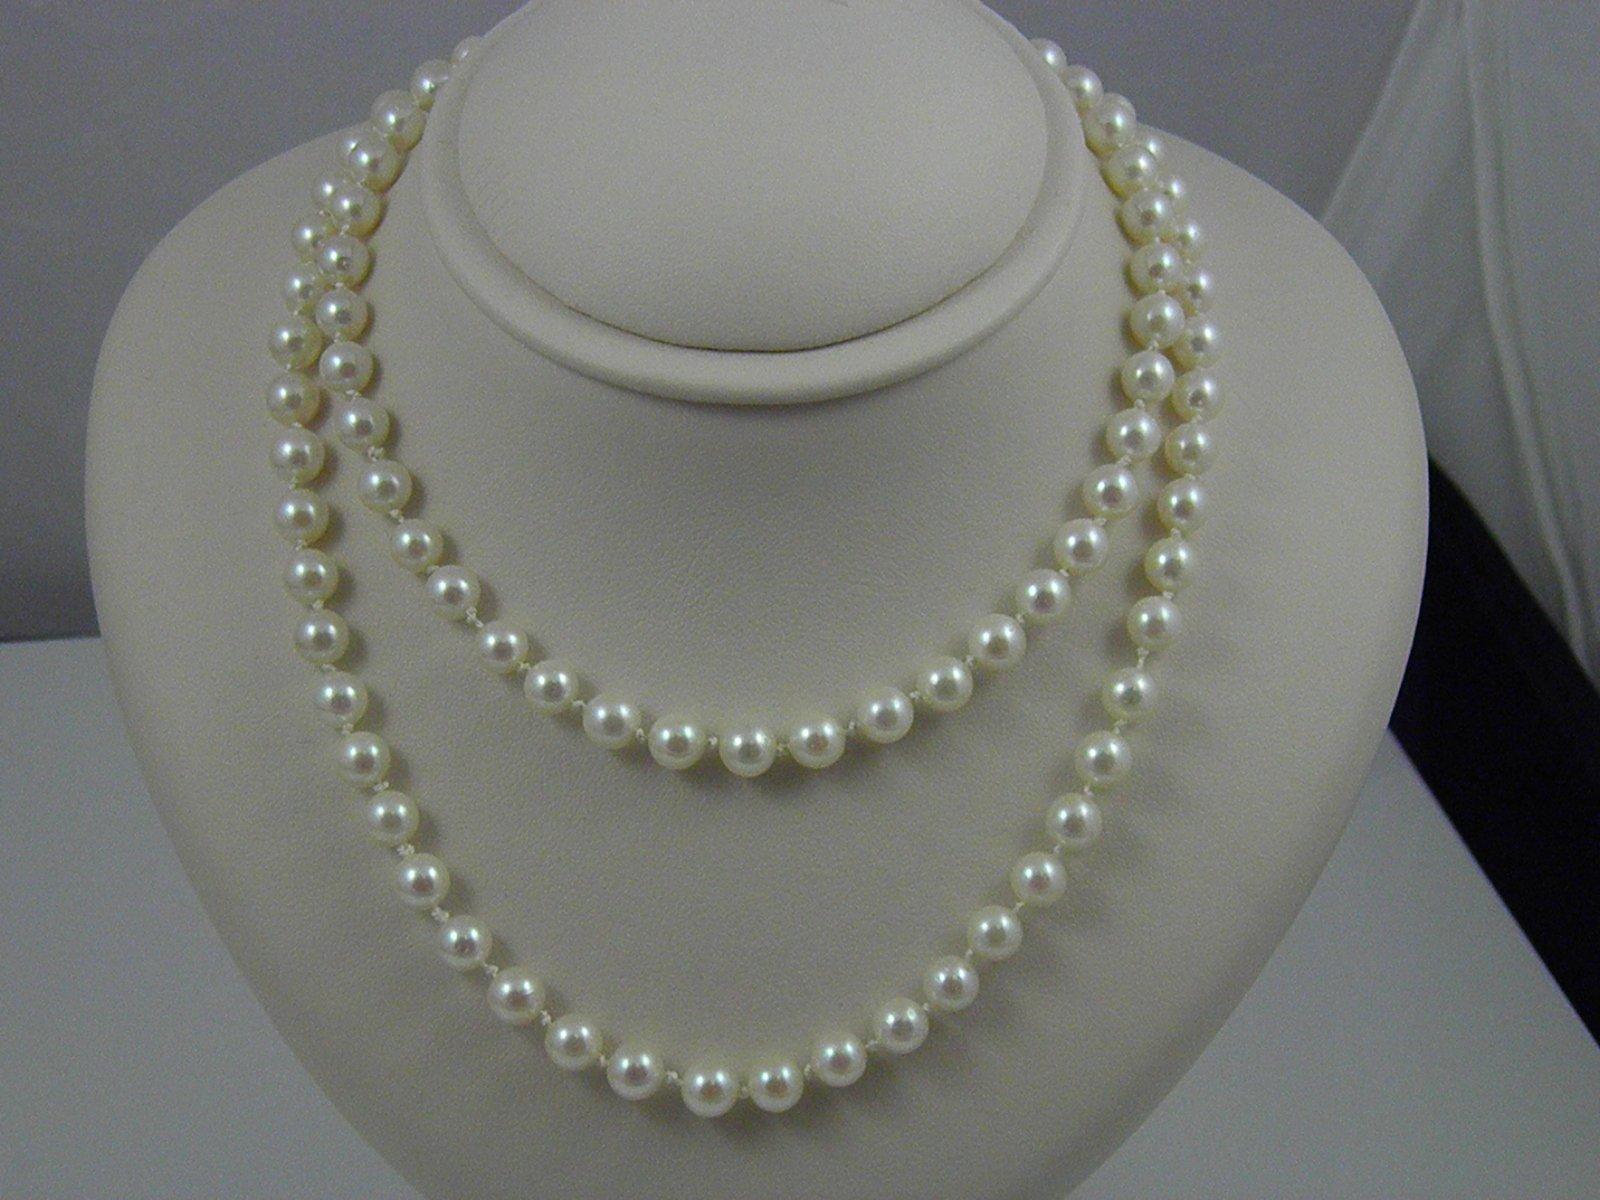 d6578ea20142b Estate Mikimoto Pearl Necklace - Federal Way Custom Jewelers